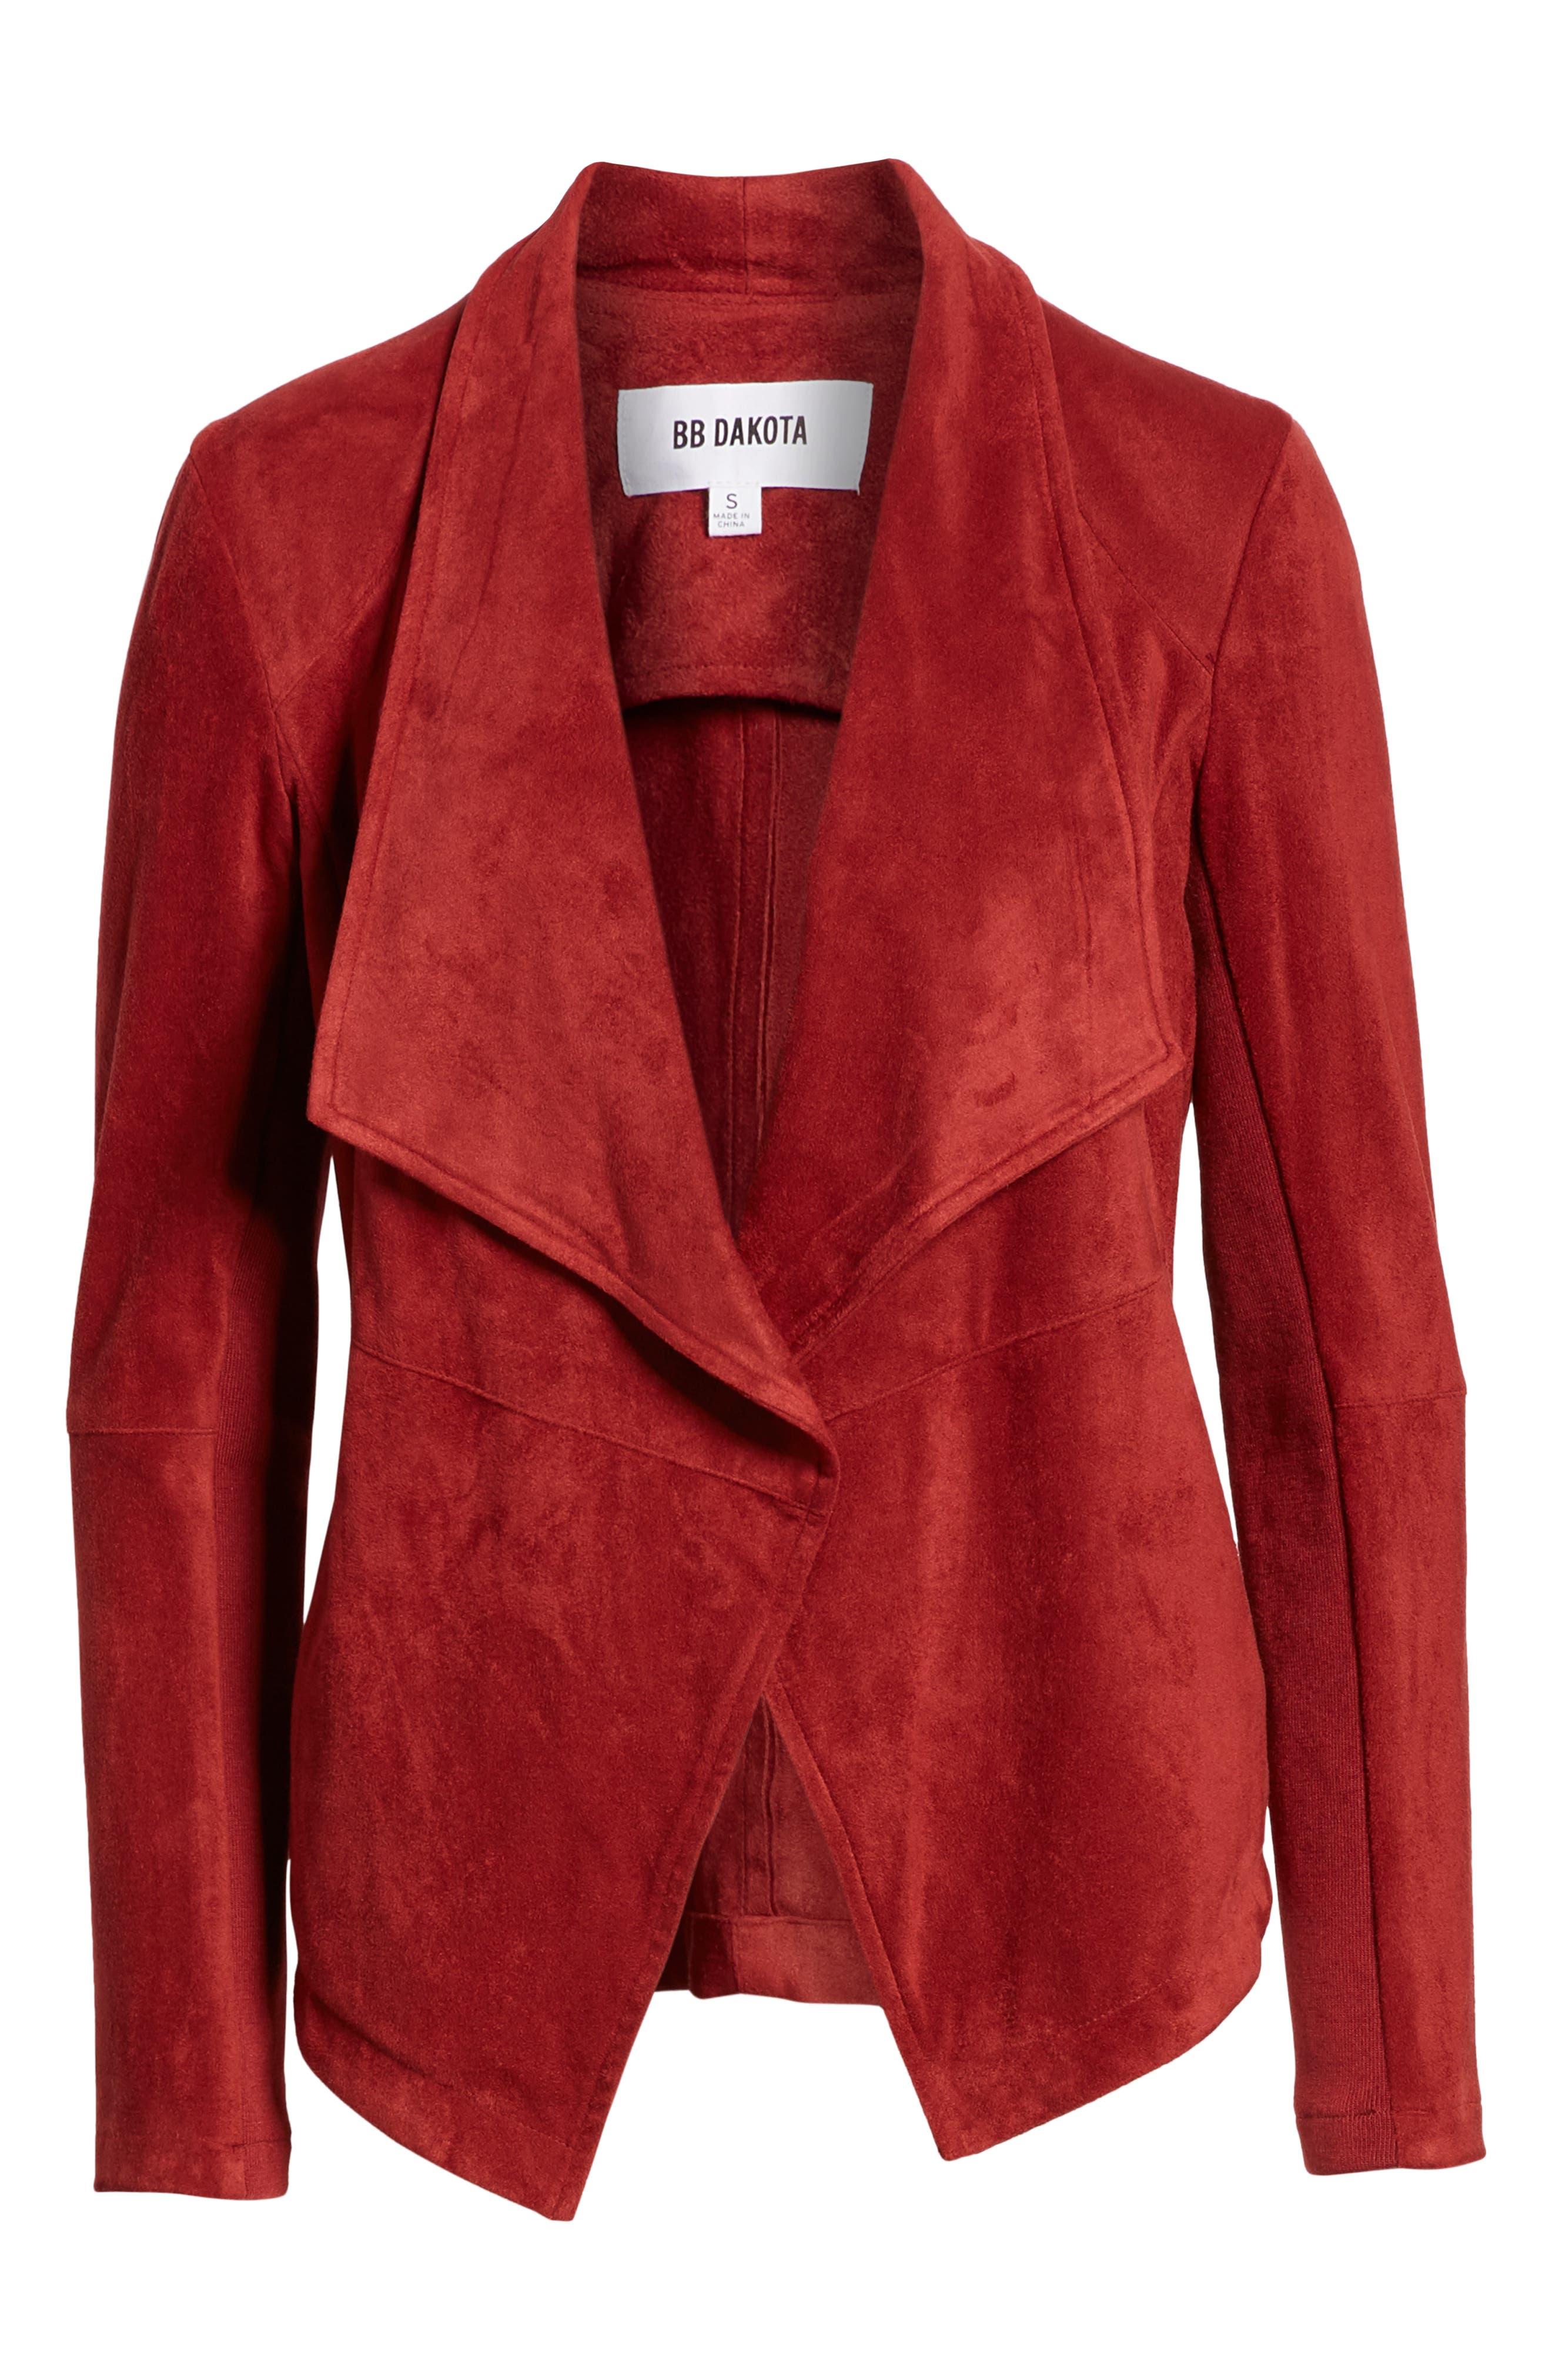 BB DAKOTA,                             Nicholson Faux Suede Drape Front Jacket,                             Alternate thumbnail 6, color,                             BRICK RED